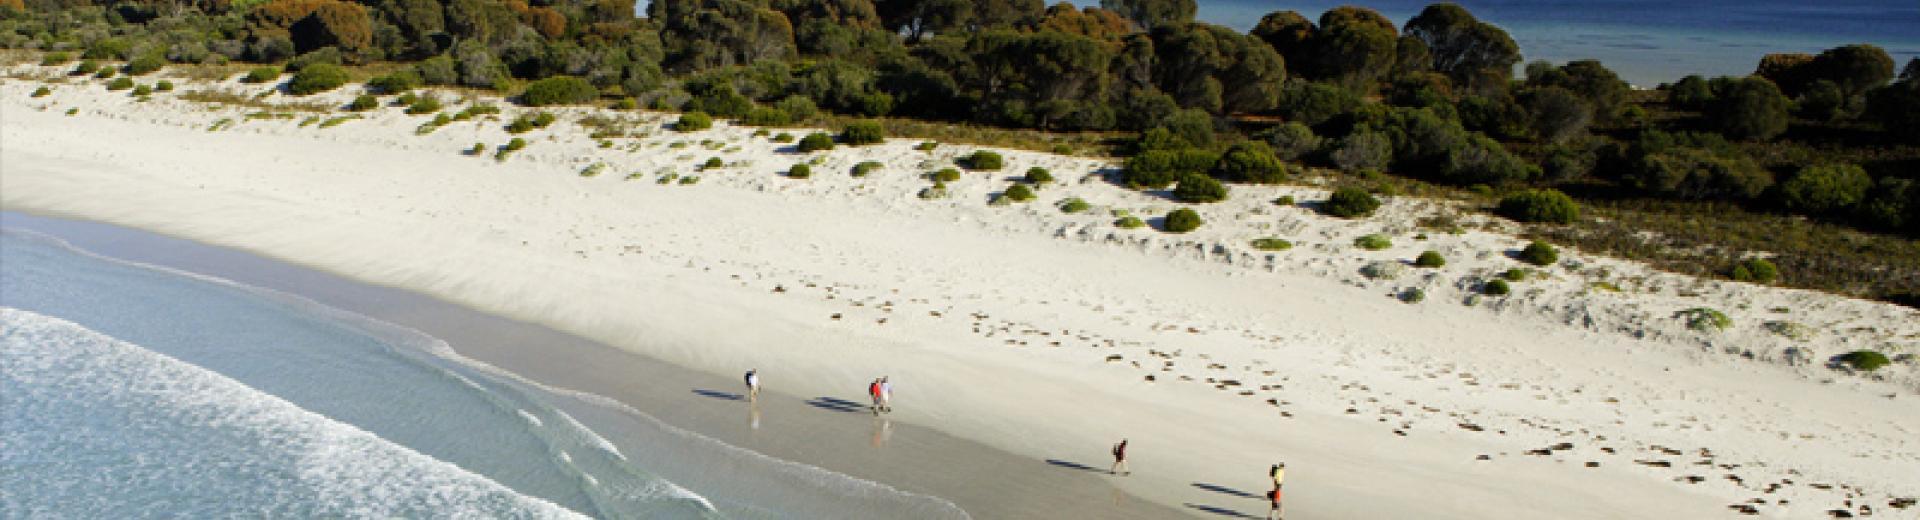 Reidle Beach Walking